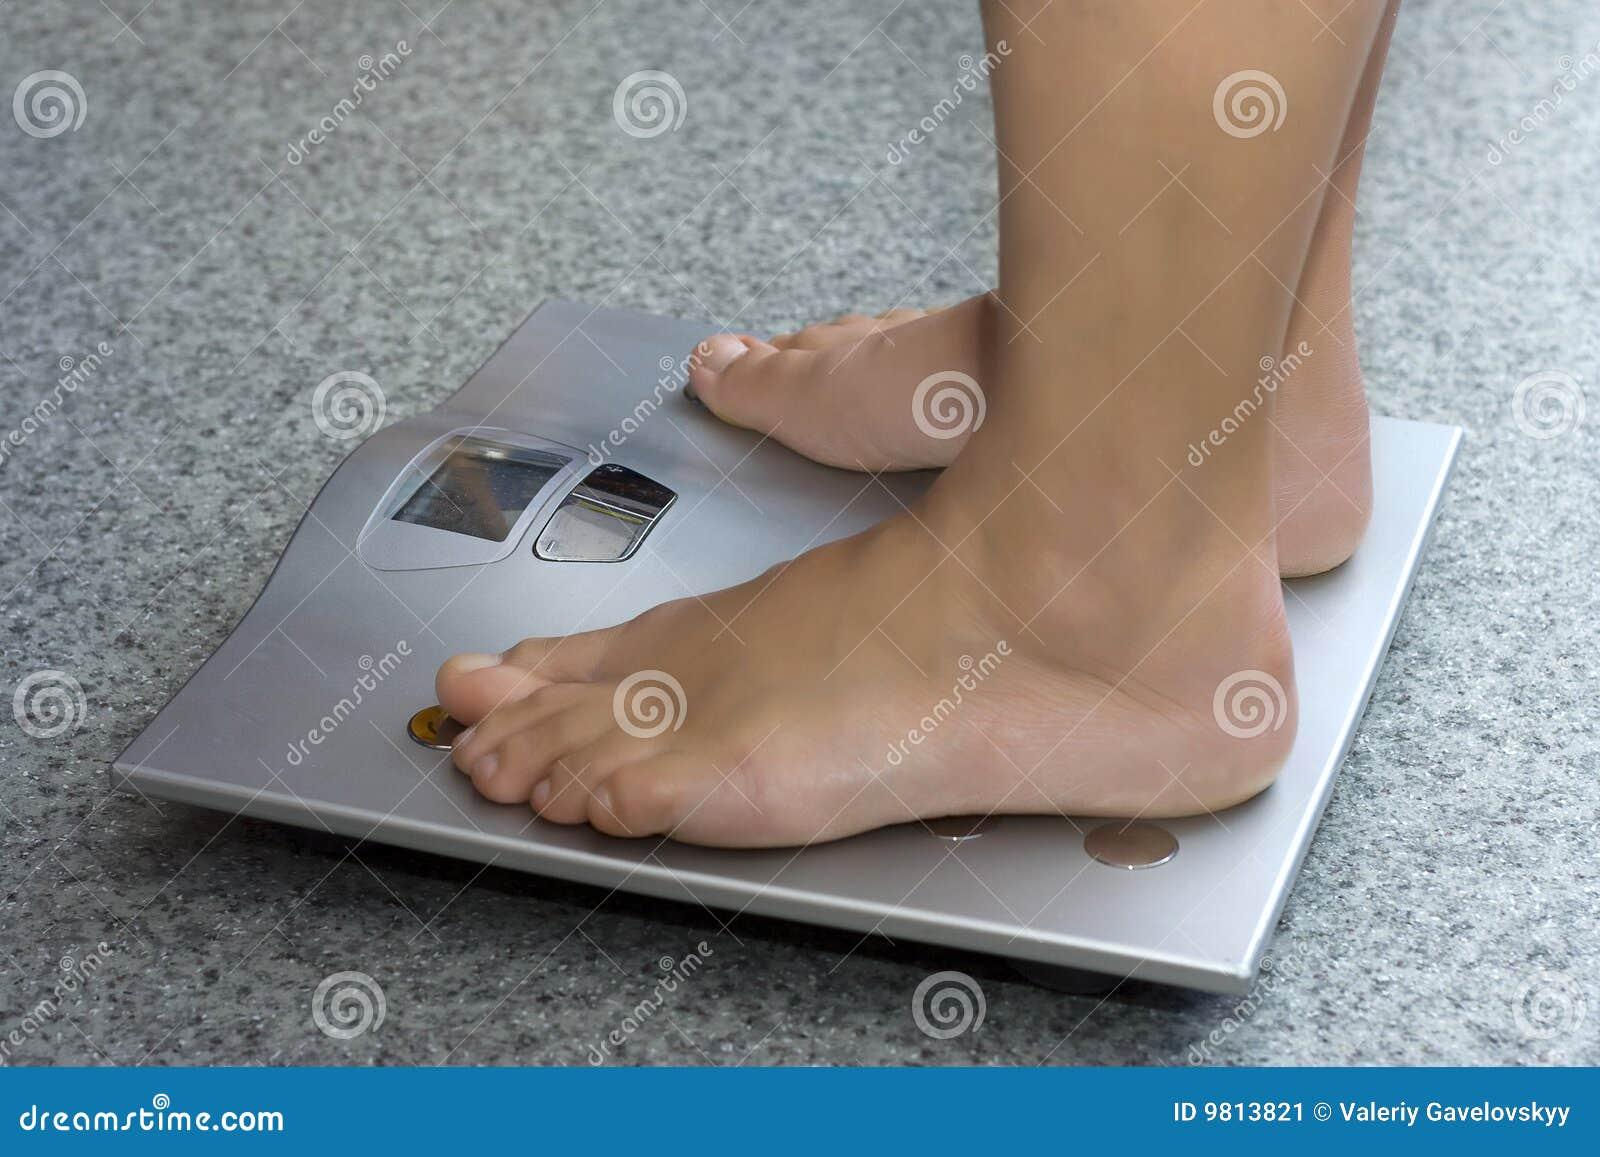 Bathroom feet scale